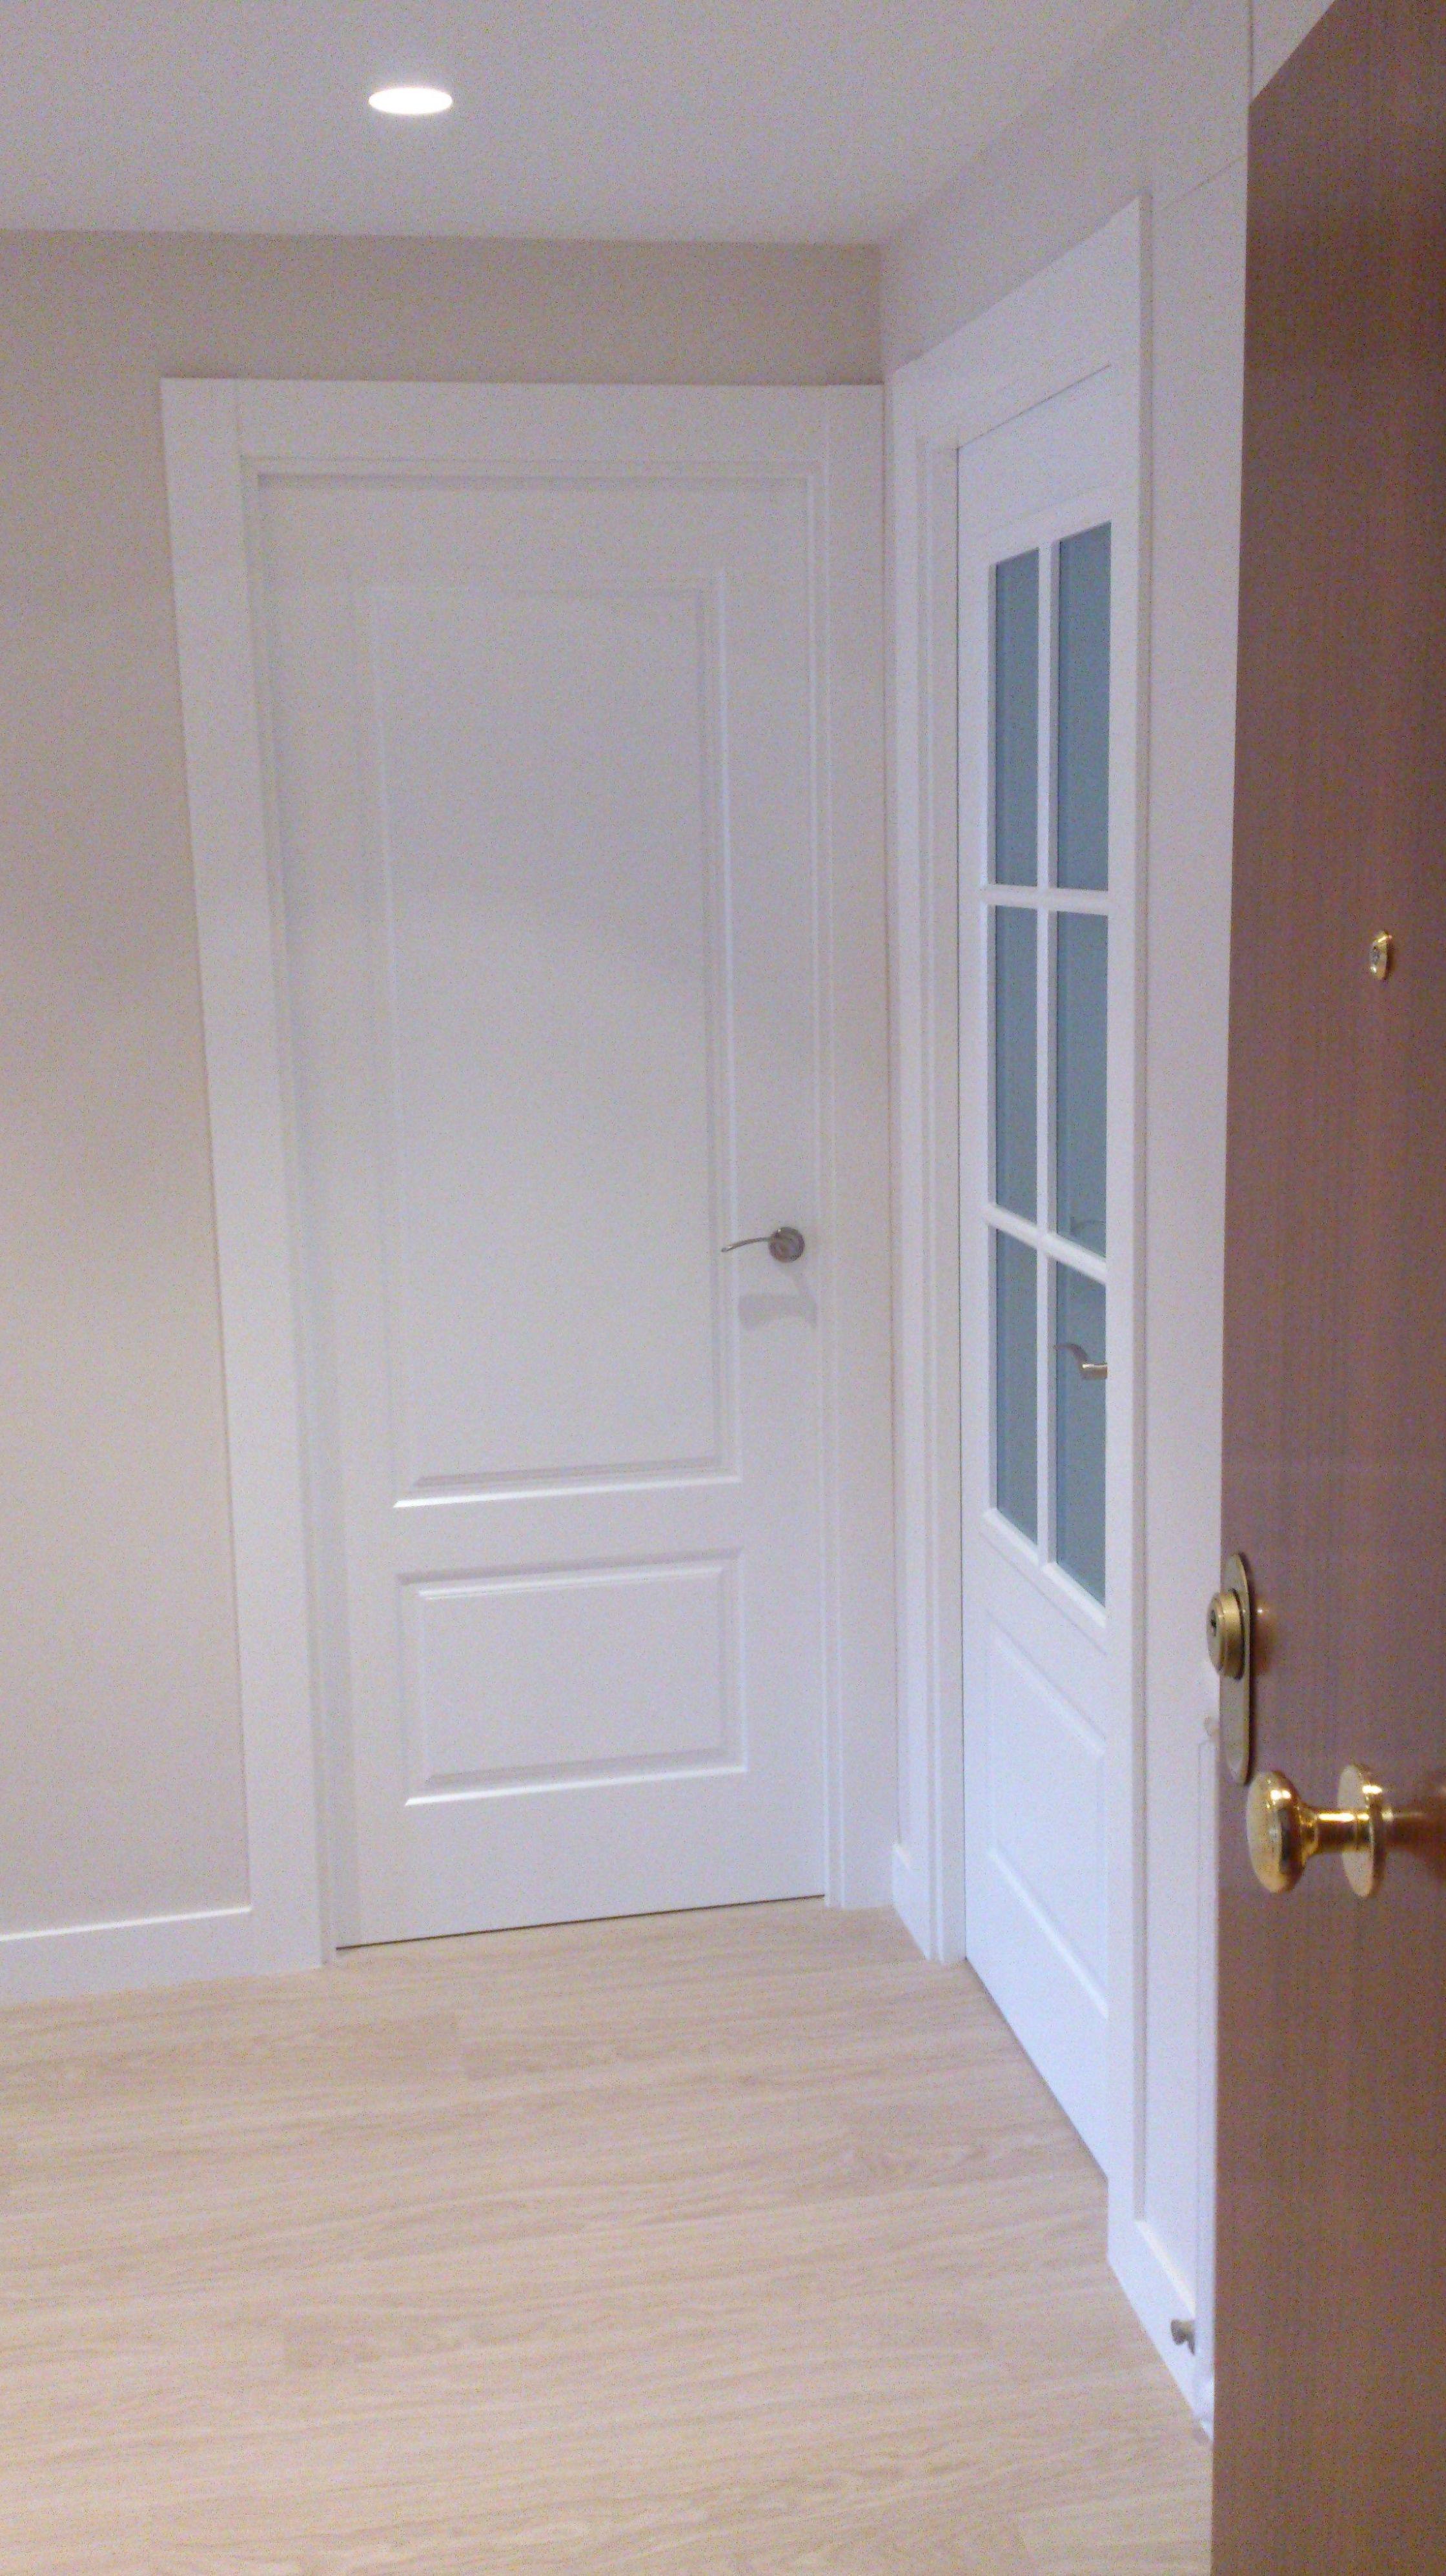 puertas blancas vitoria